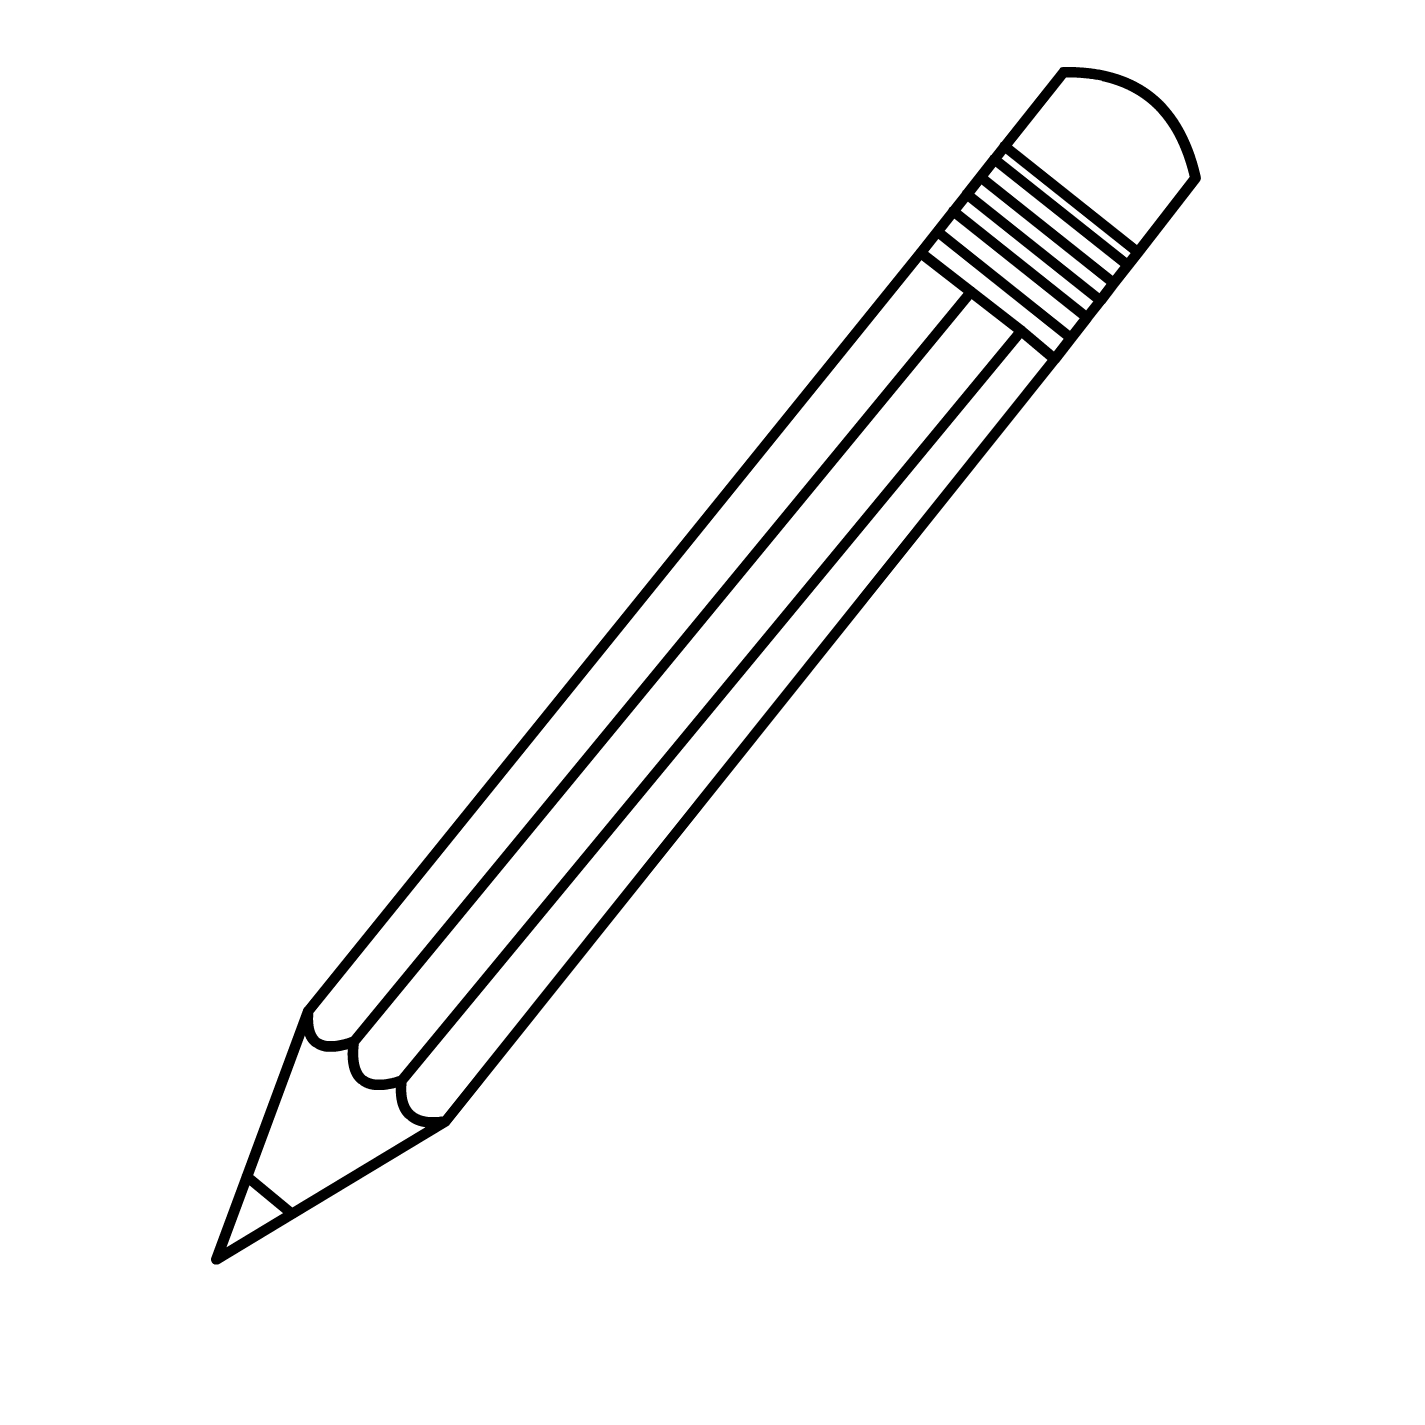 tužka.jpg